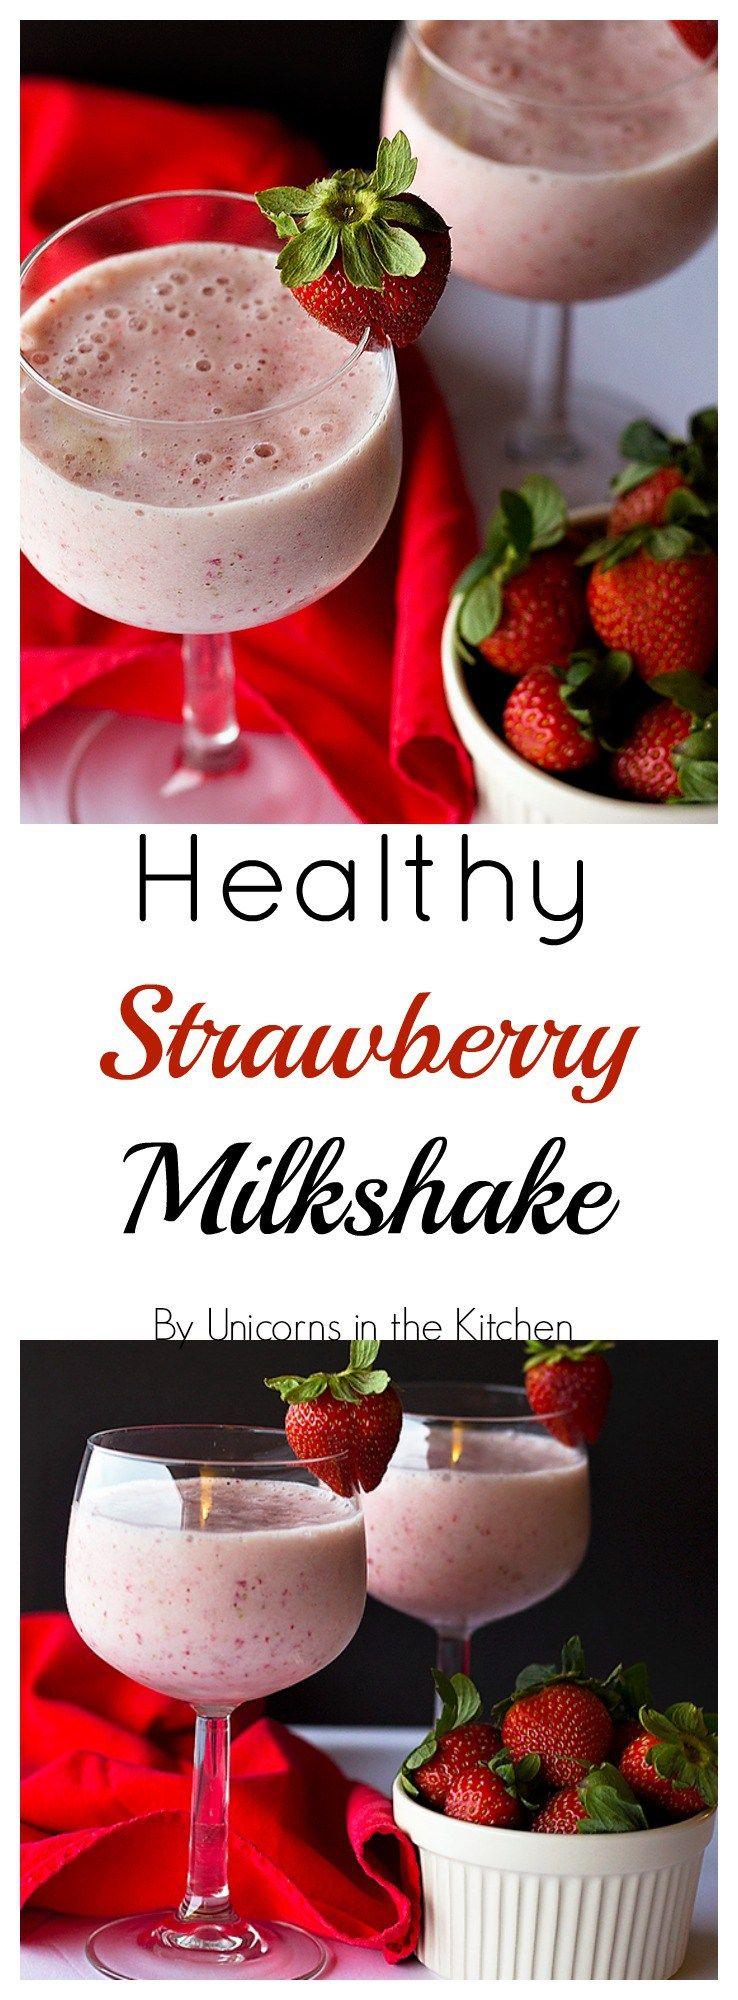 Park Art|My WordPress Blog_Chick Fil A Milkshake Calories Strawberry